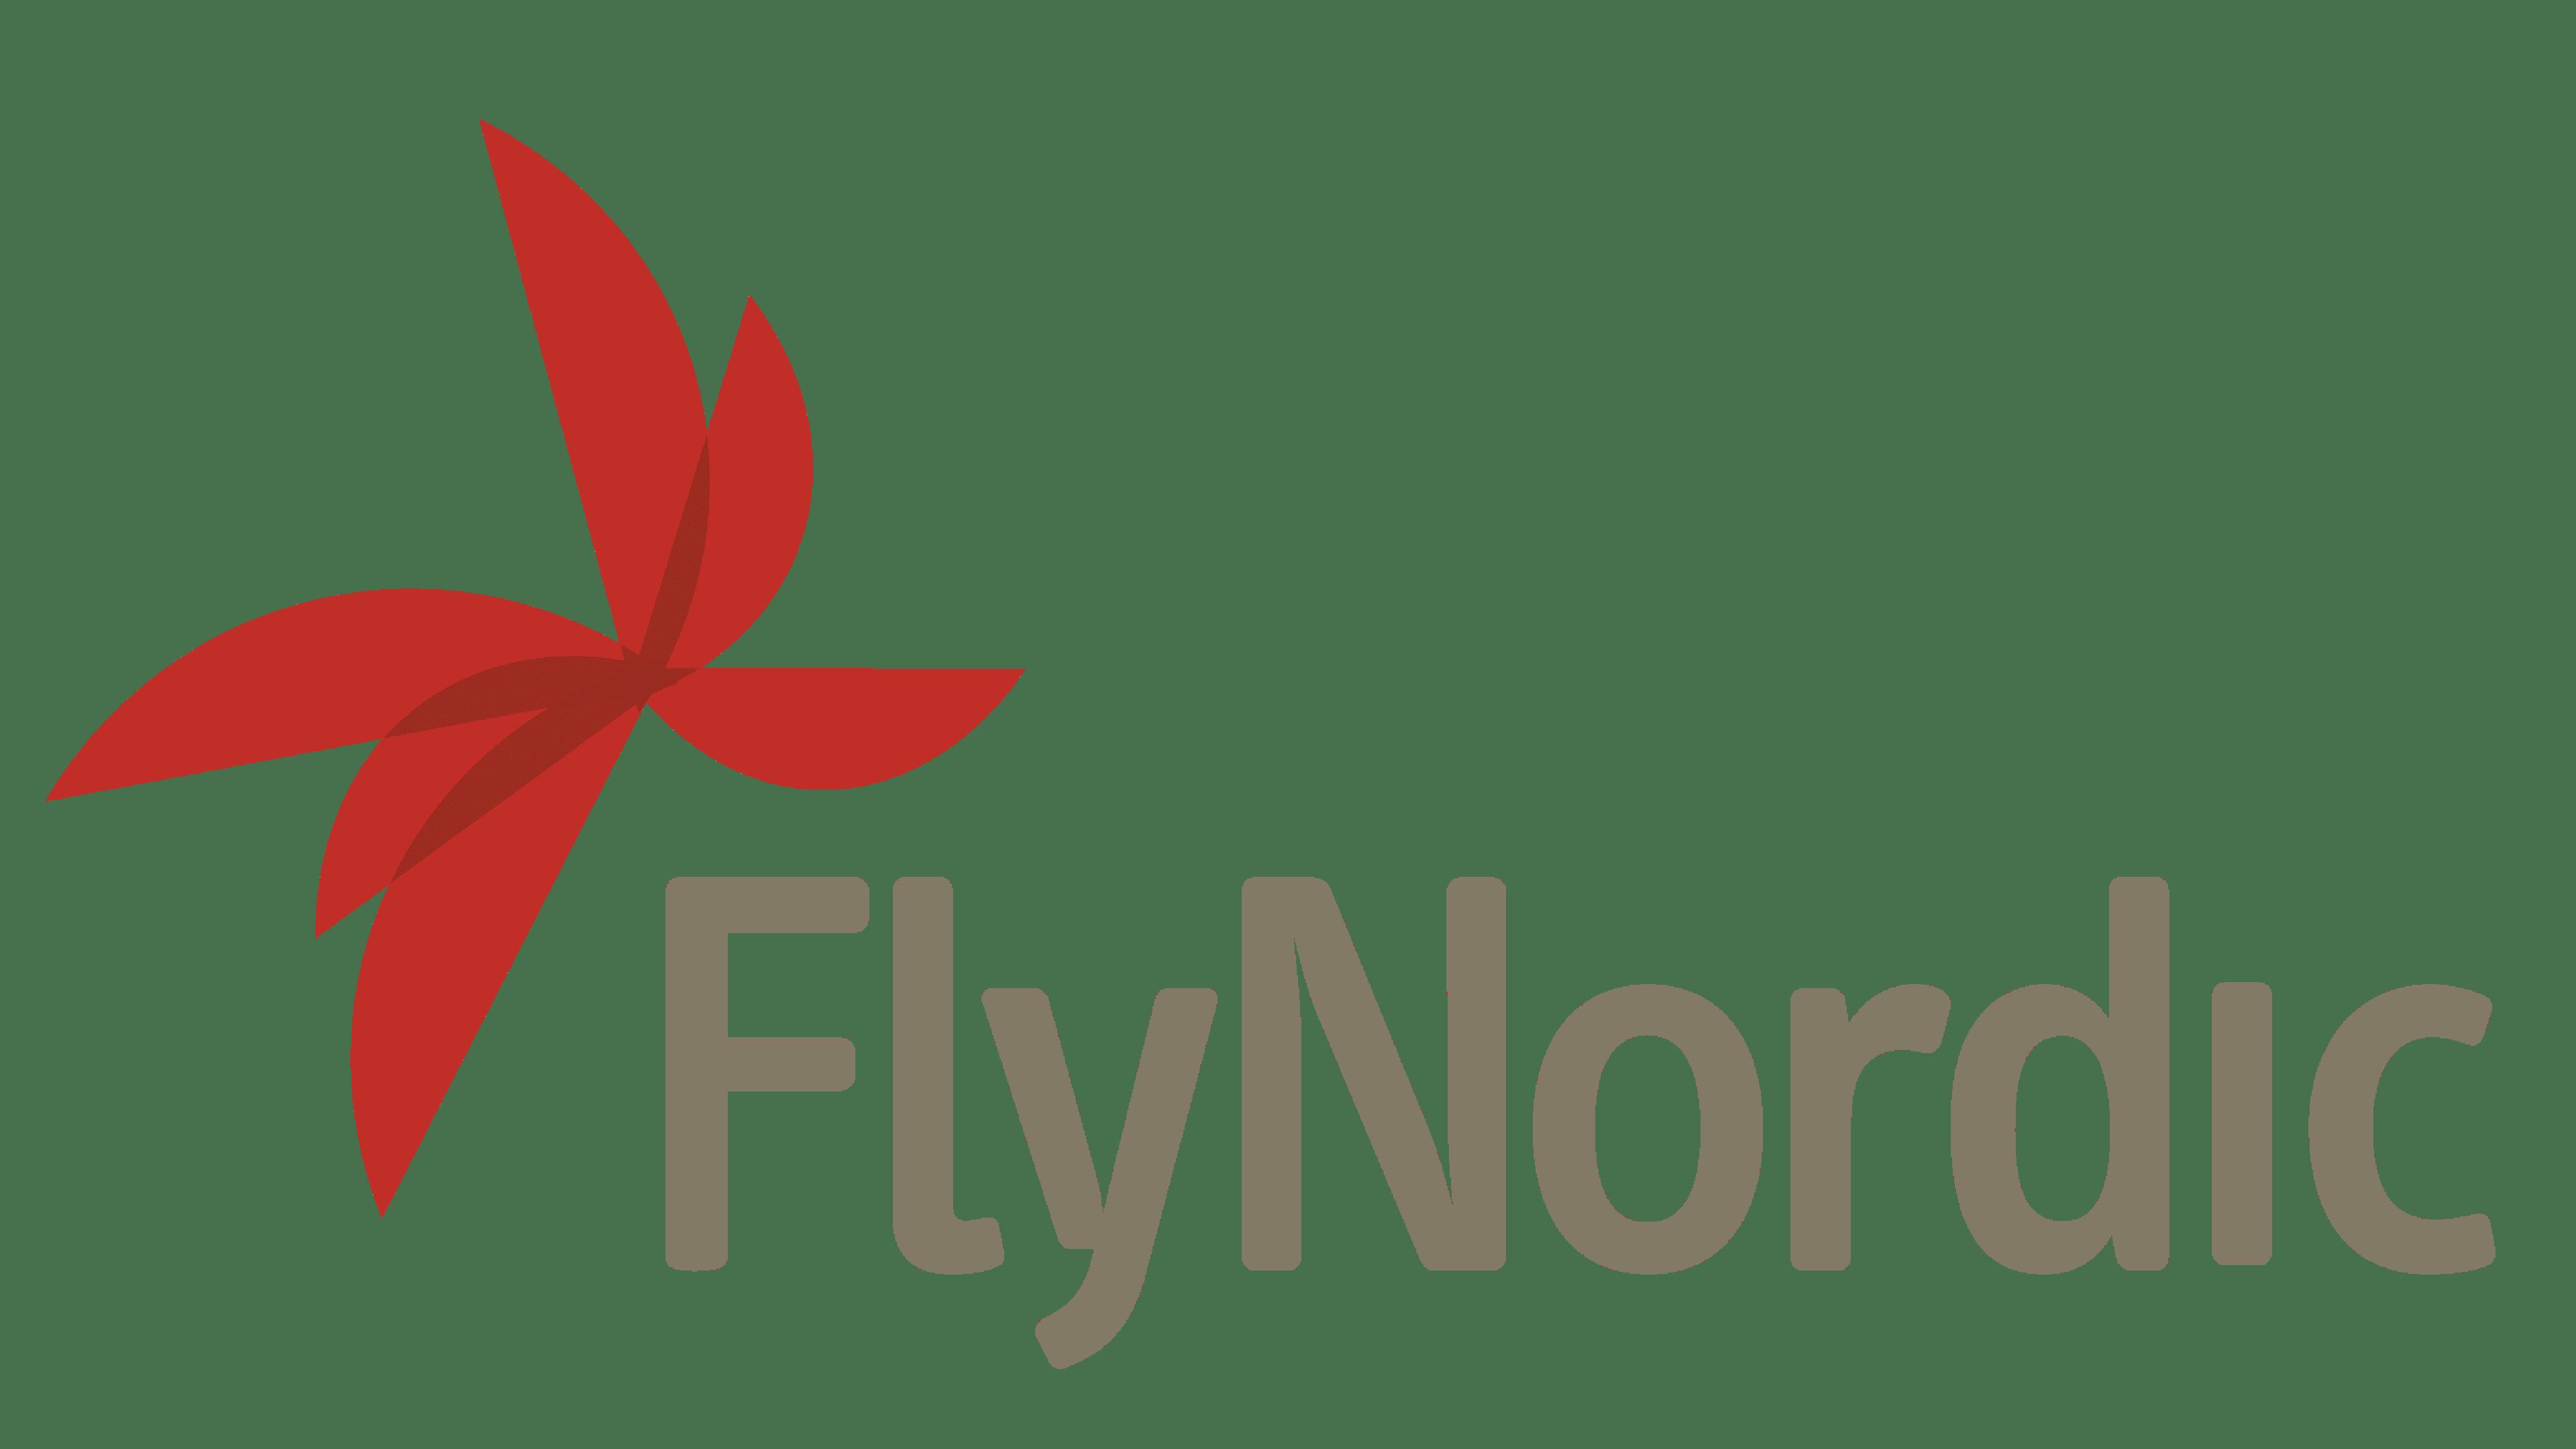 FlyNordic Logo Logo